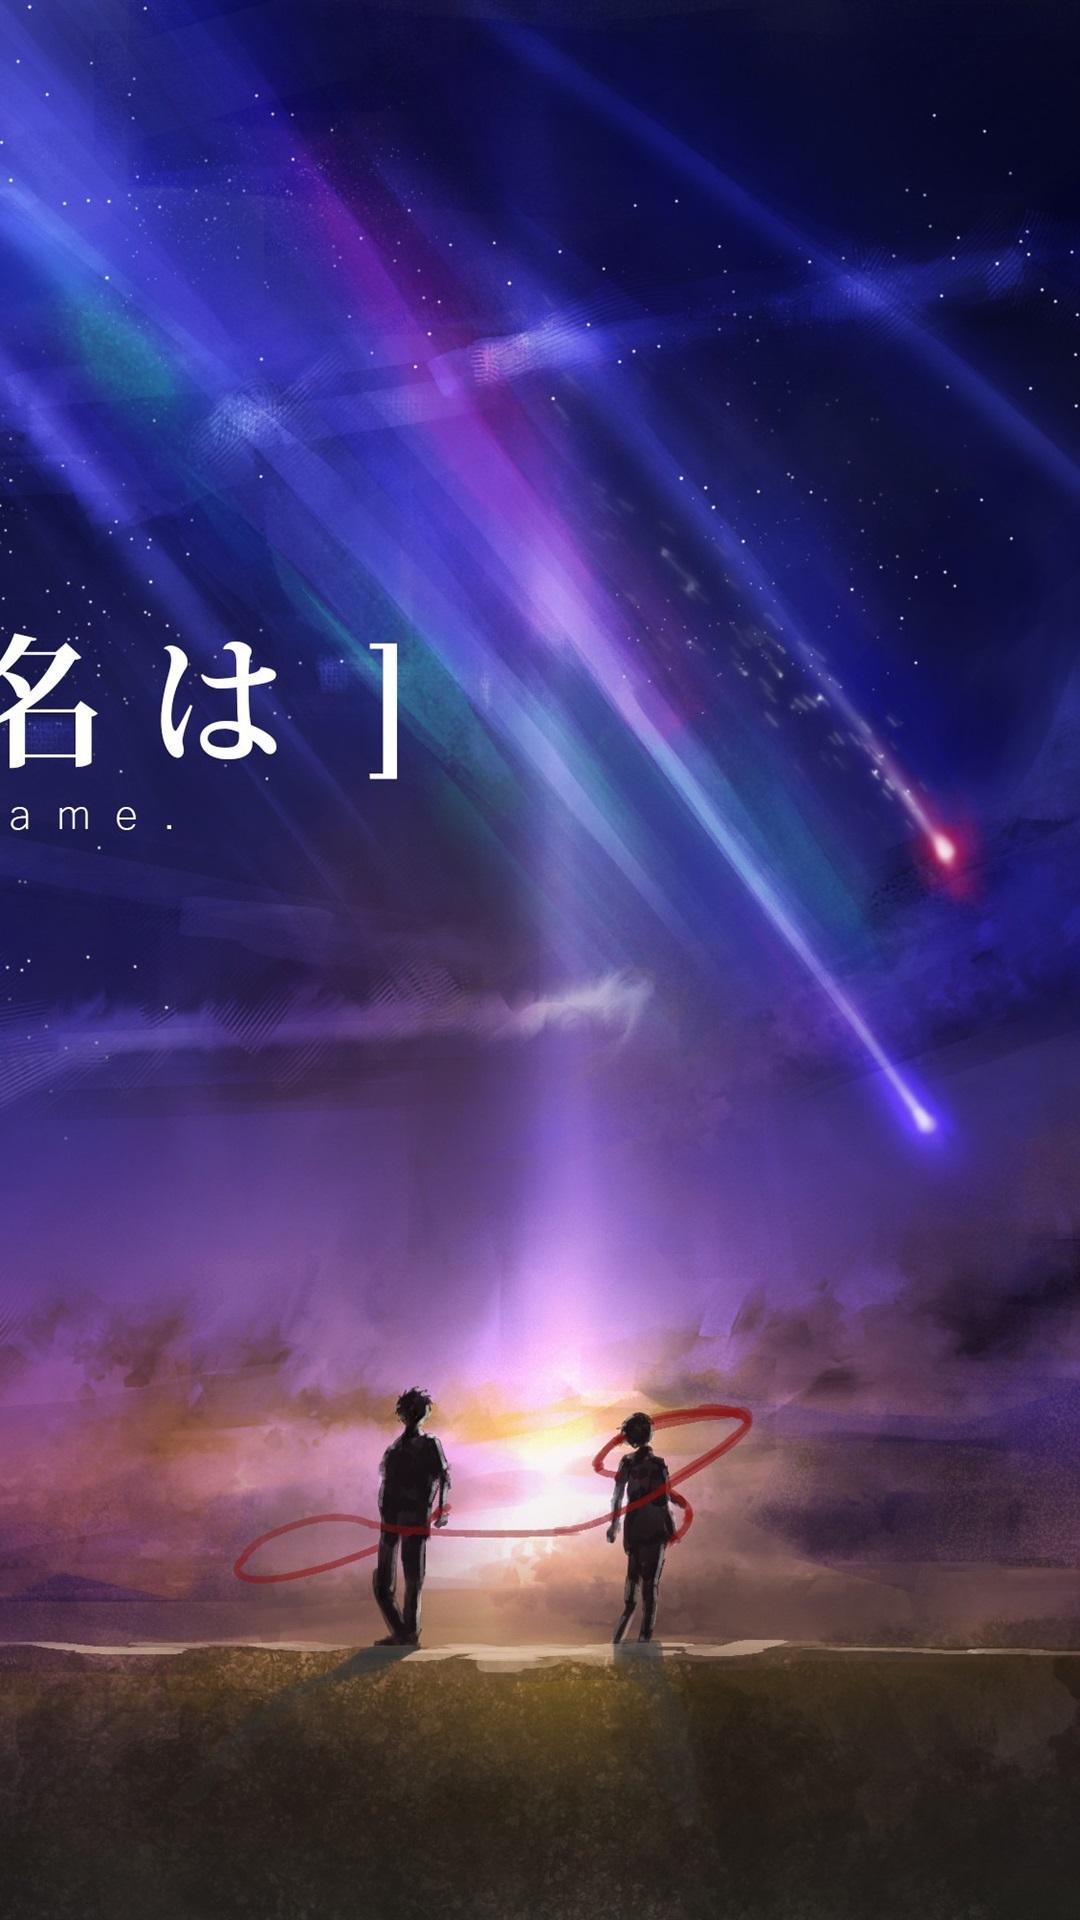 Kimi No Na Wa Live Wallpaper Android Download - Singebloggg